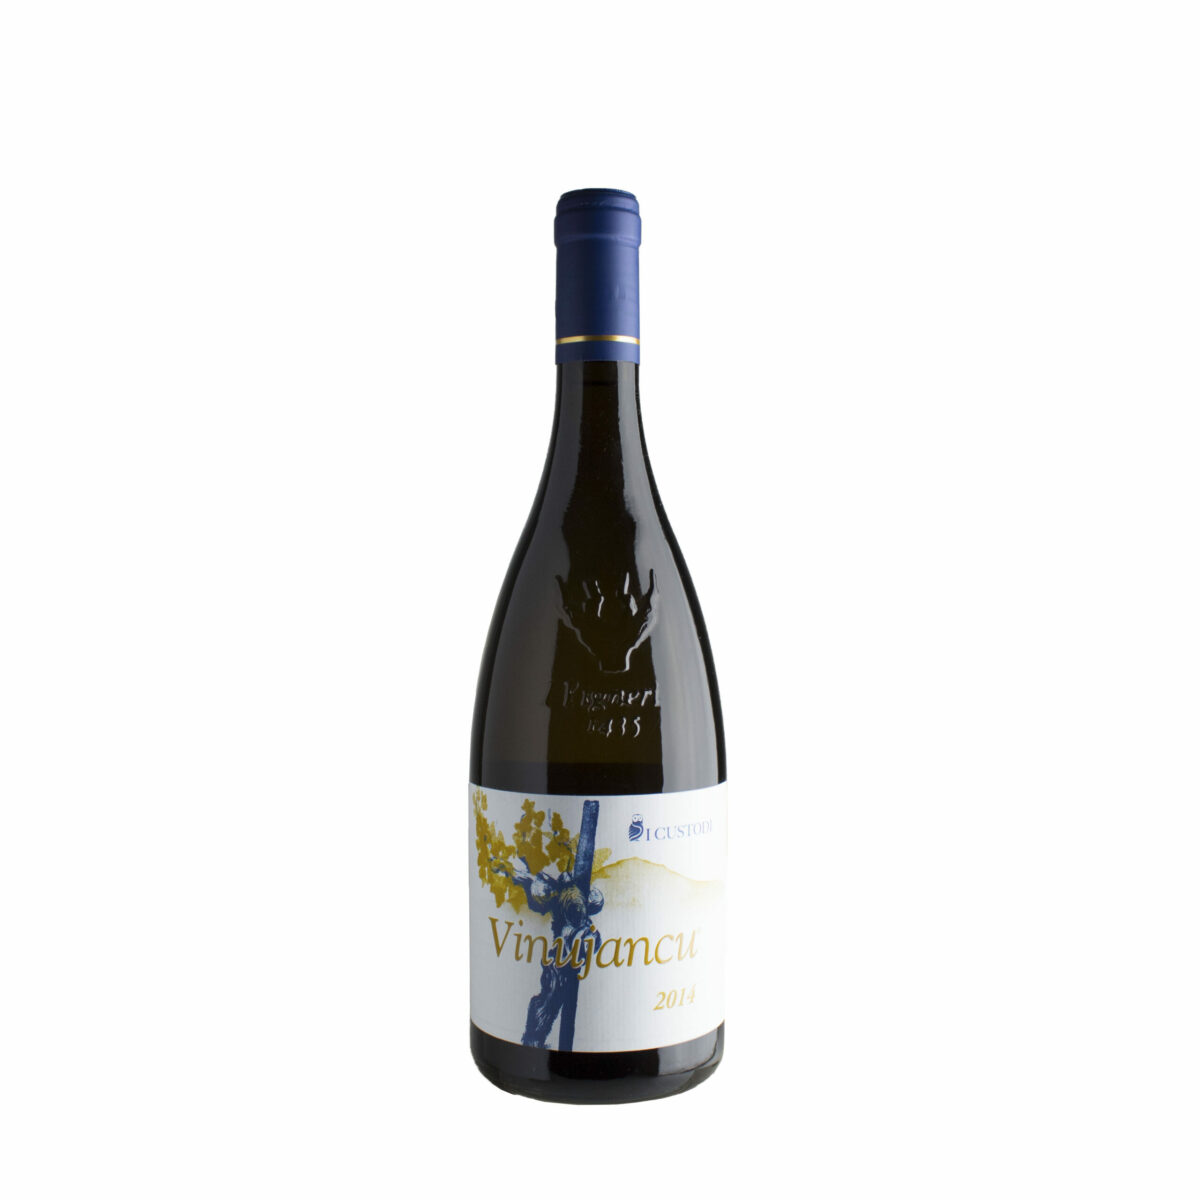 I Custodi delle vigne dell'Etna Etna Bianco 'Vinujancu' 2014